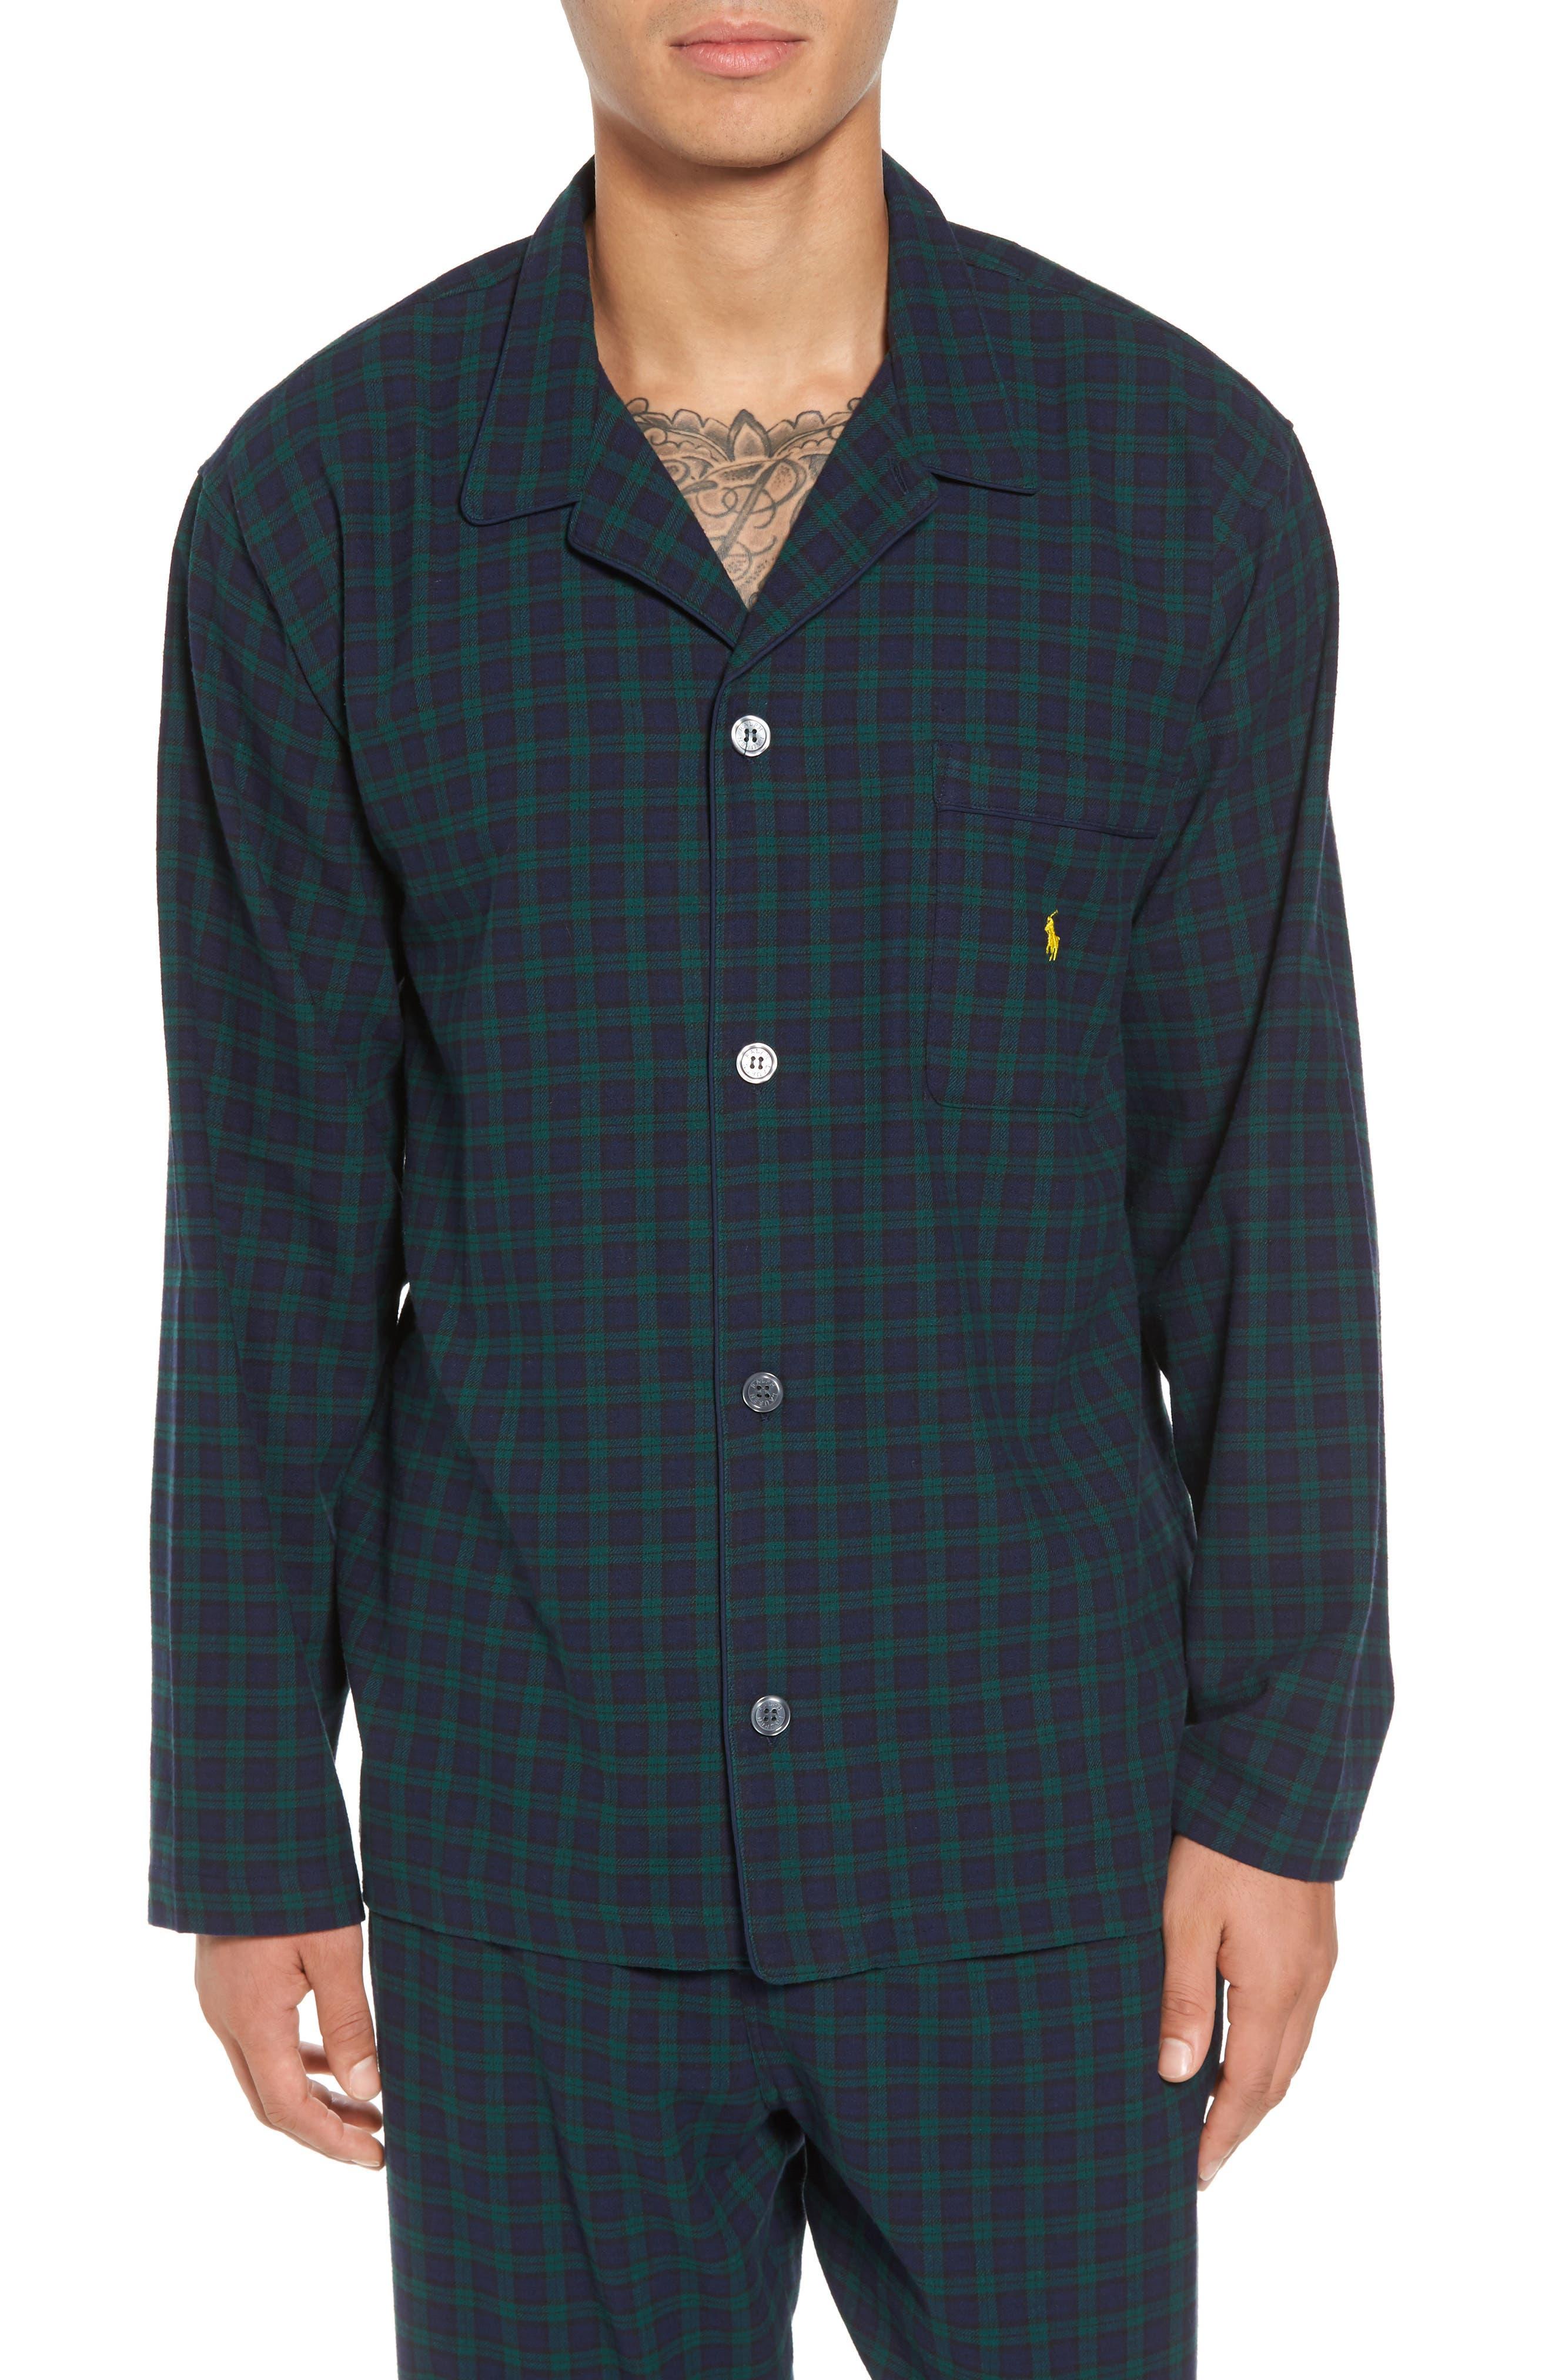 Polo Ralph Lauren Flannel Pajama Shirt,                             Main thumbnail 3, color,